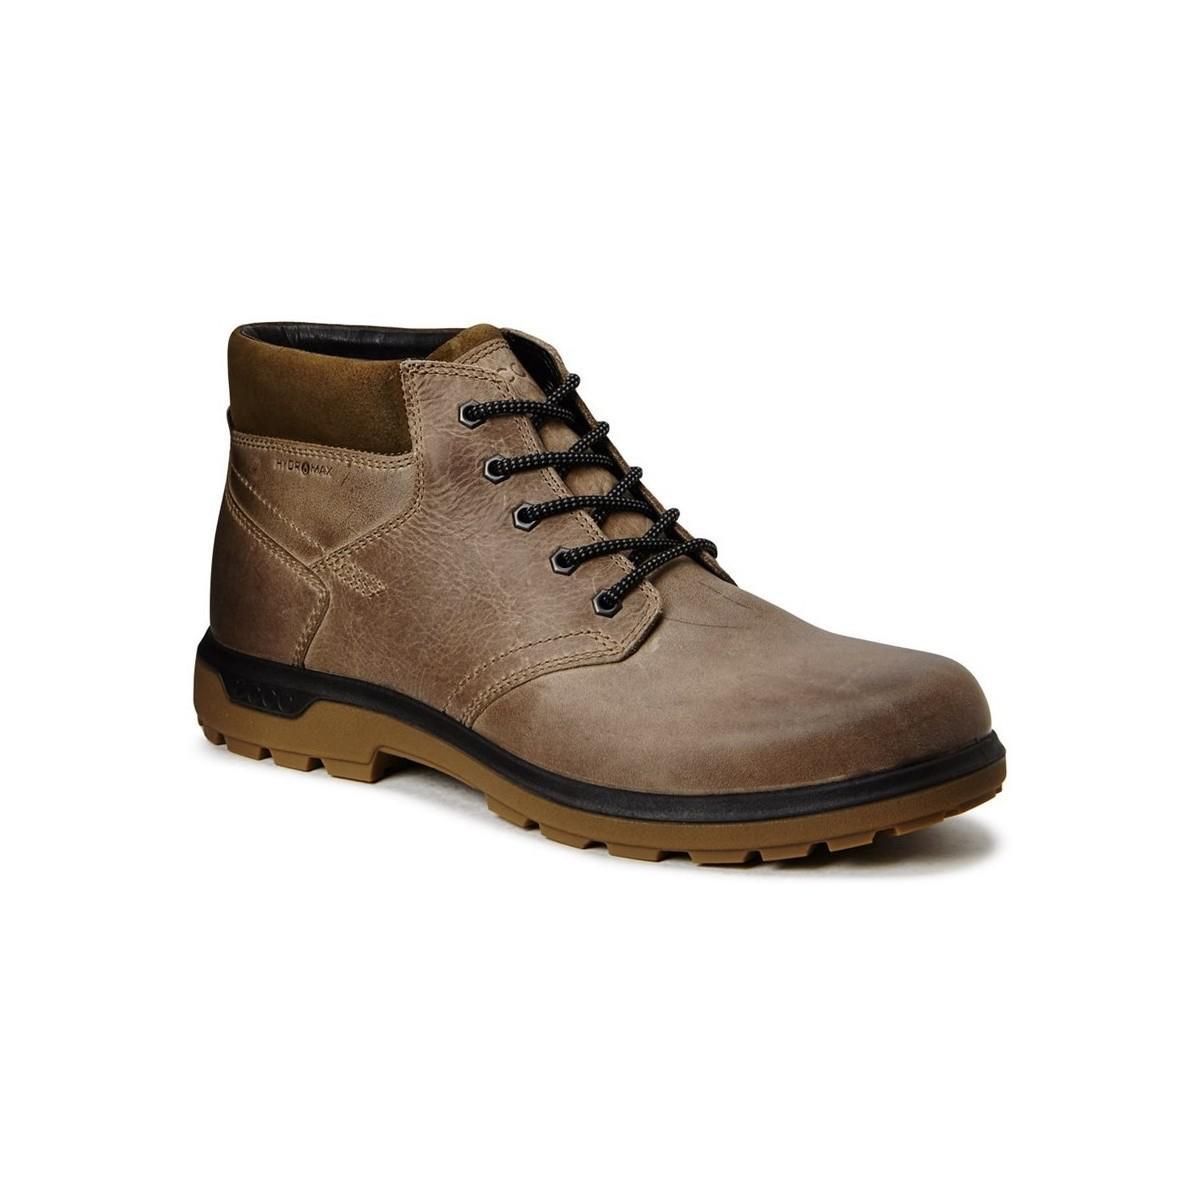 ecco WHISTLER - Walking boots - brown DZgPvT1uuh